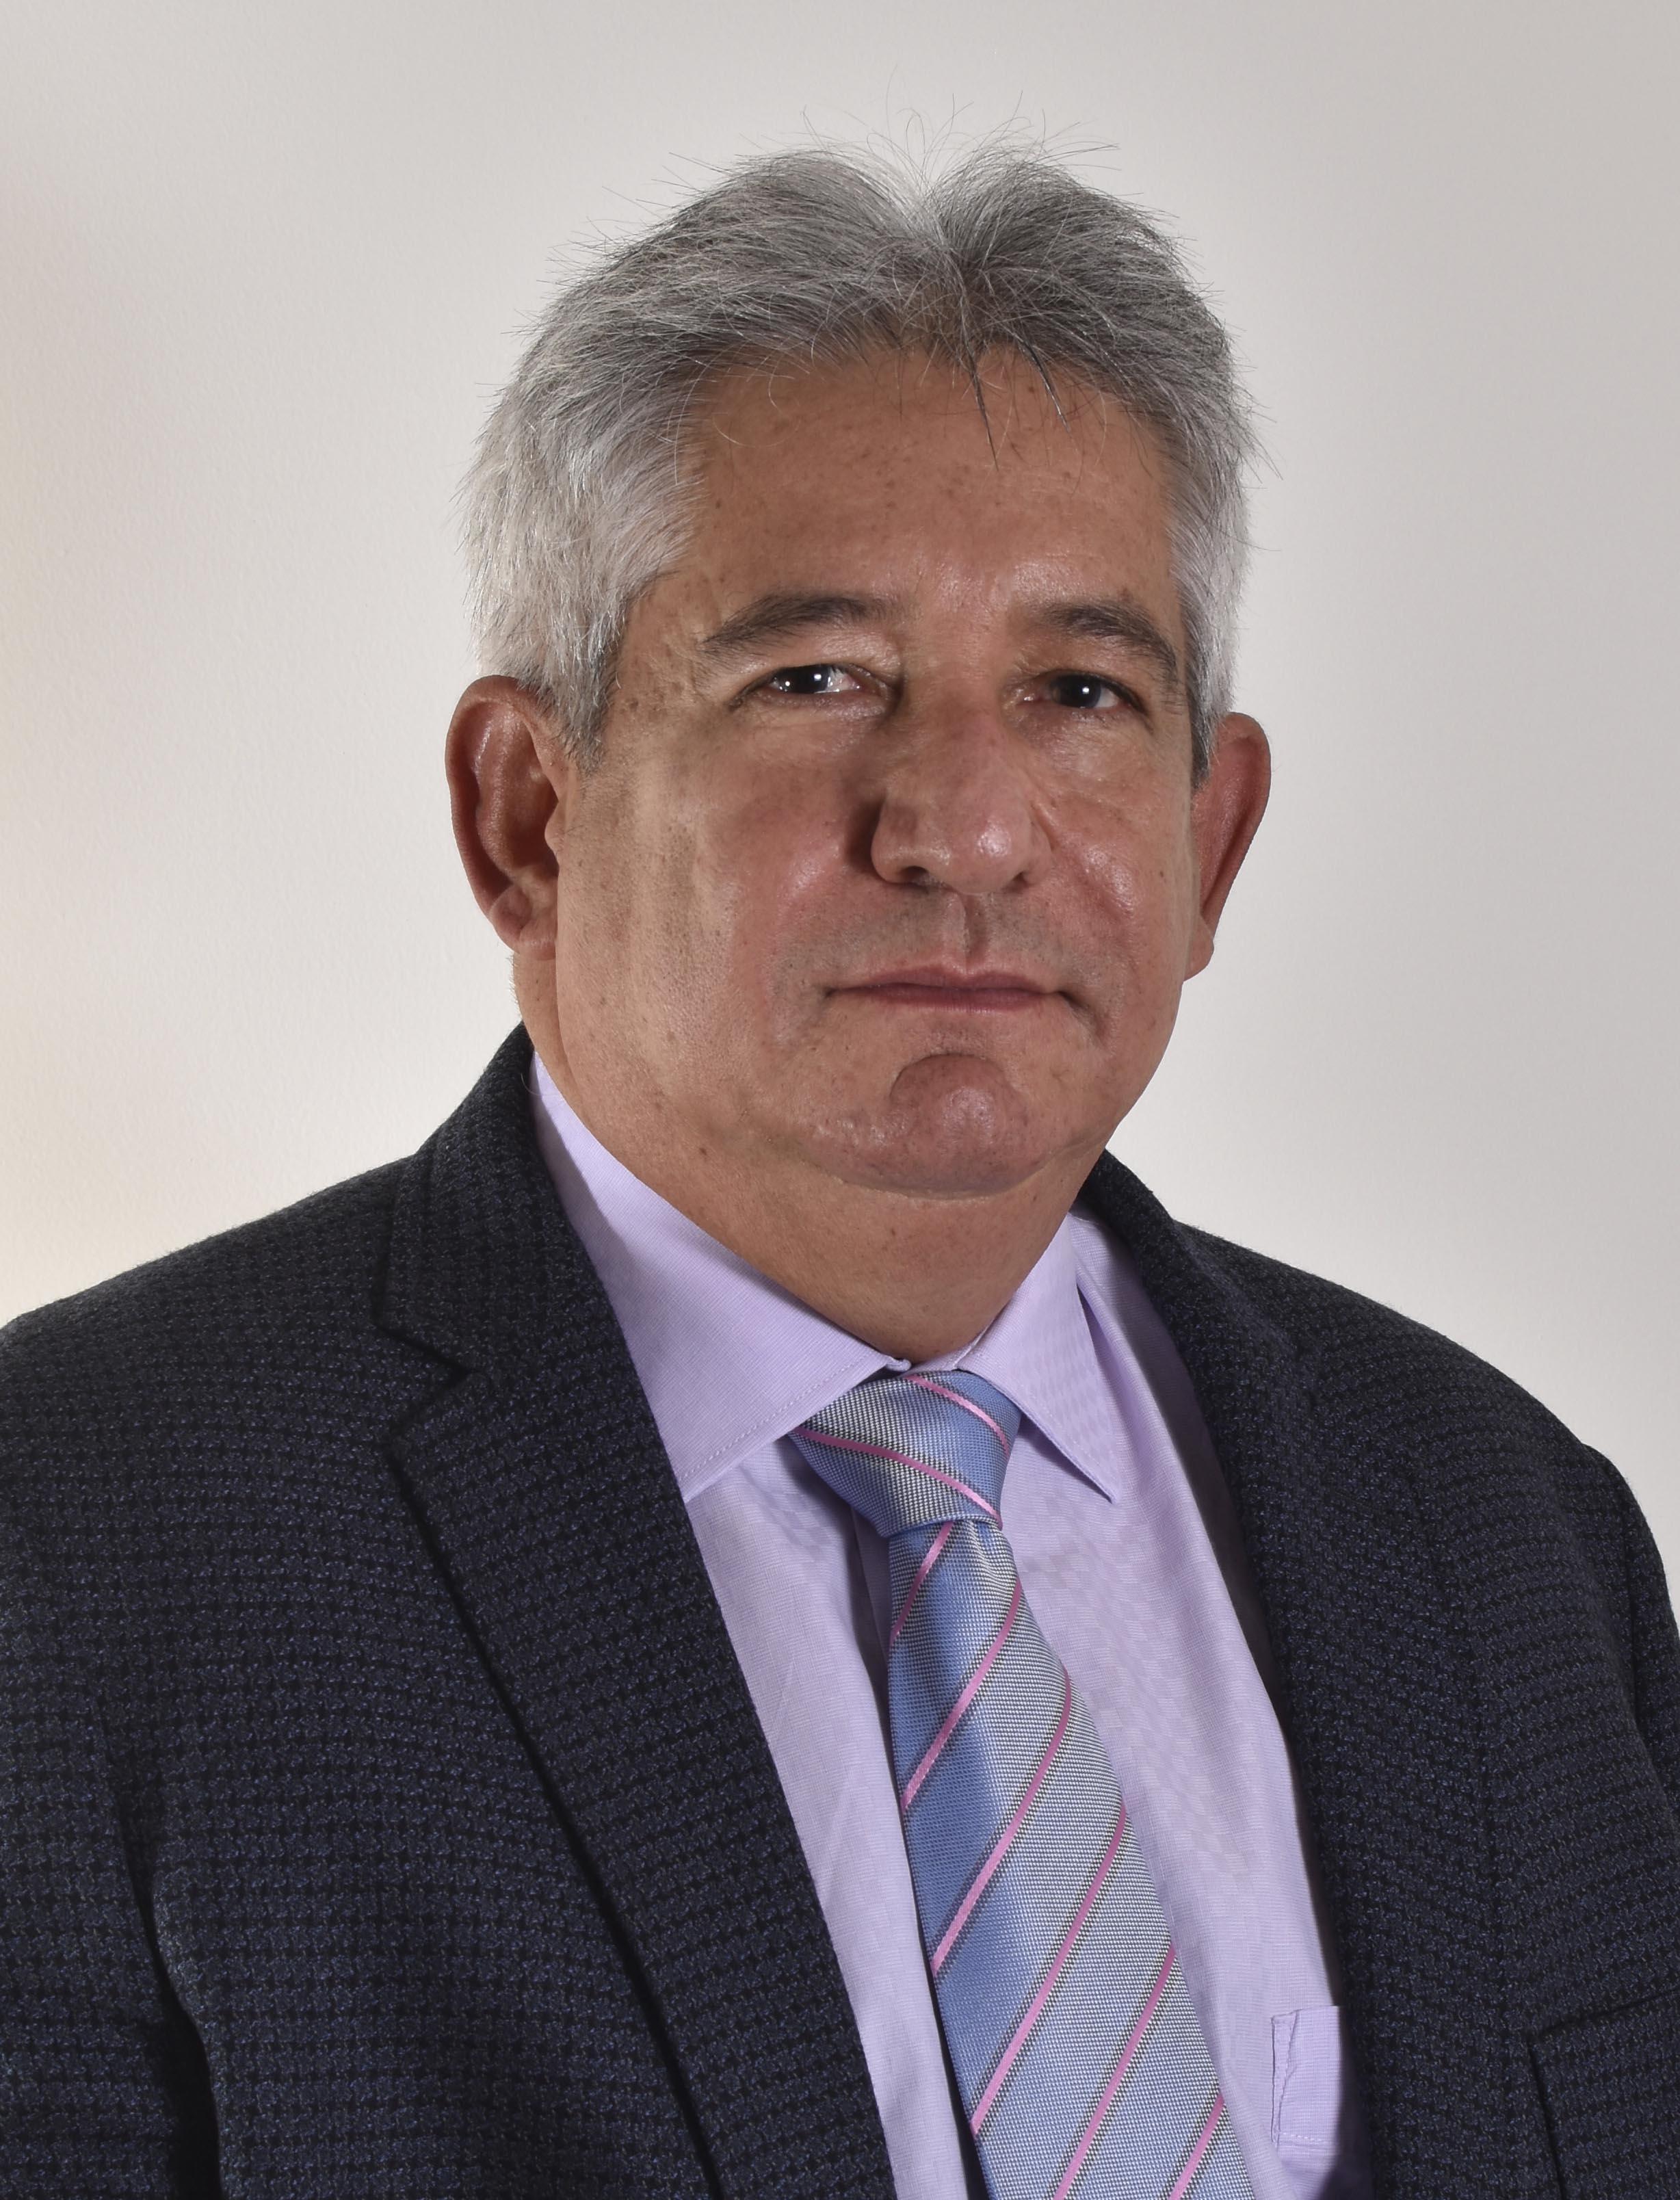 Salvador Insignares O. - Odontologo de la Universidad de Cartagena